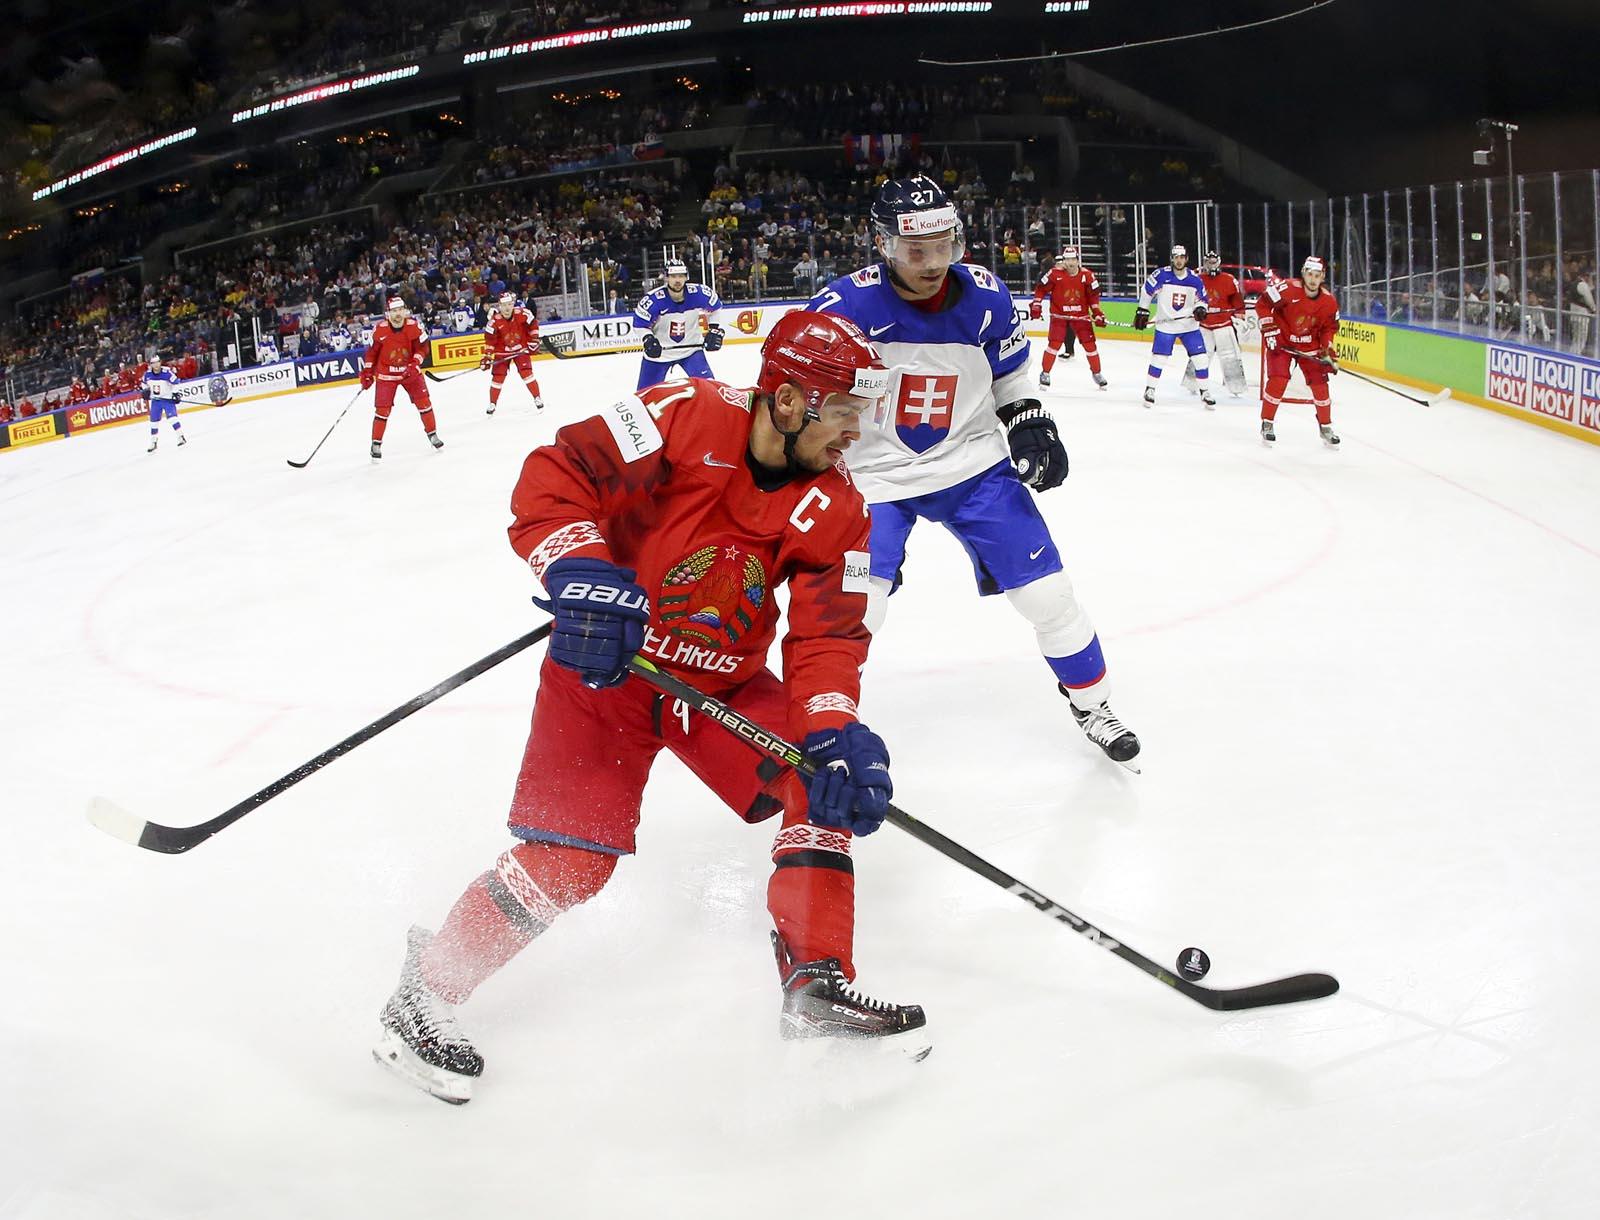 Фото использовано в качестве иллюстрации, Andre Ringuette (HHOF-IIHF Images)